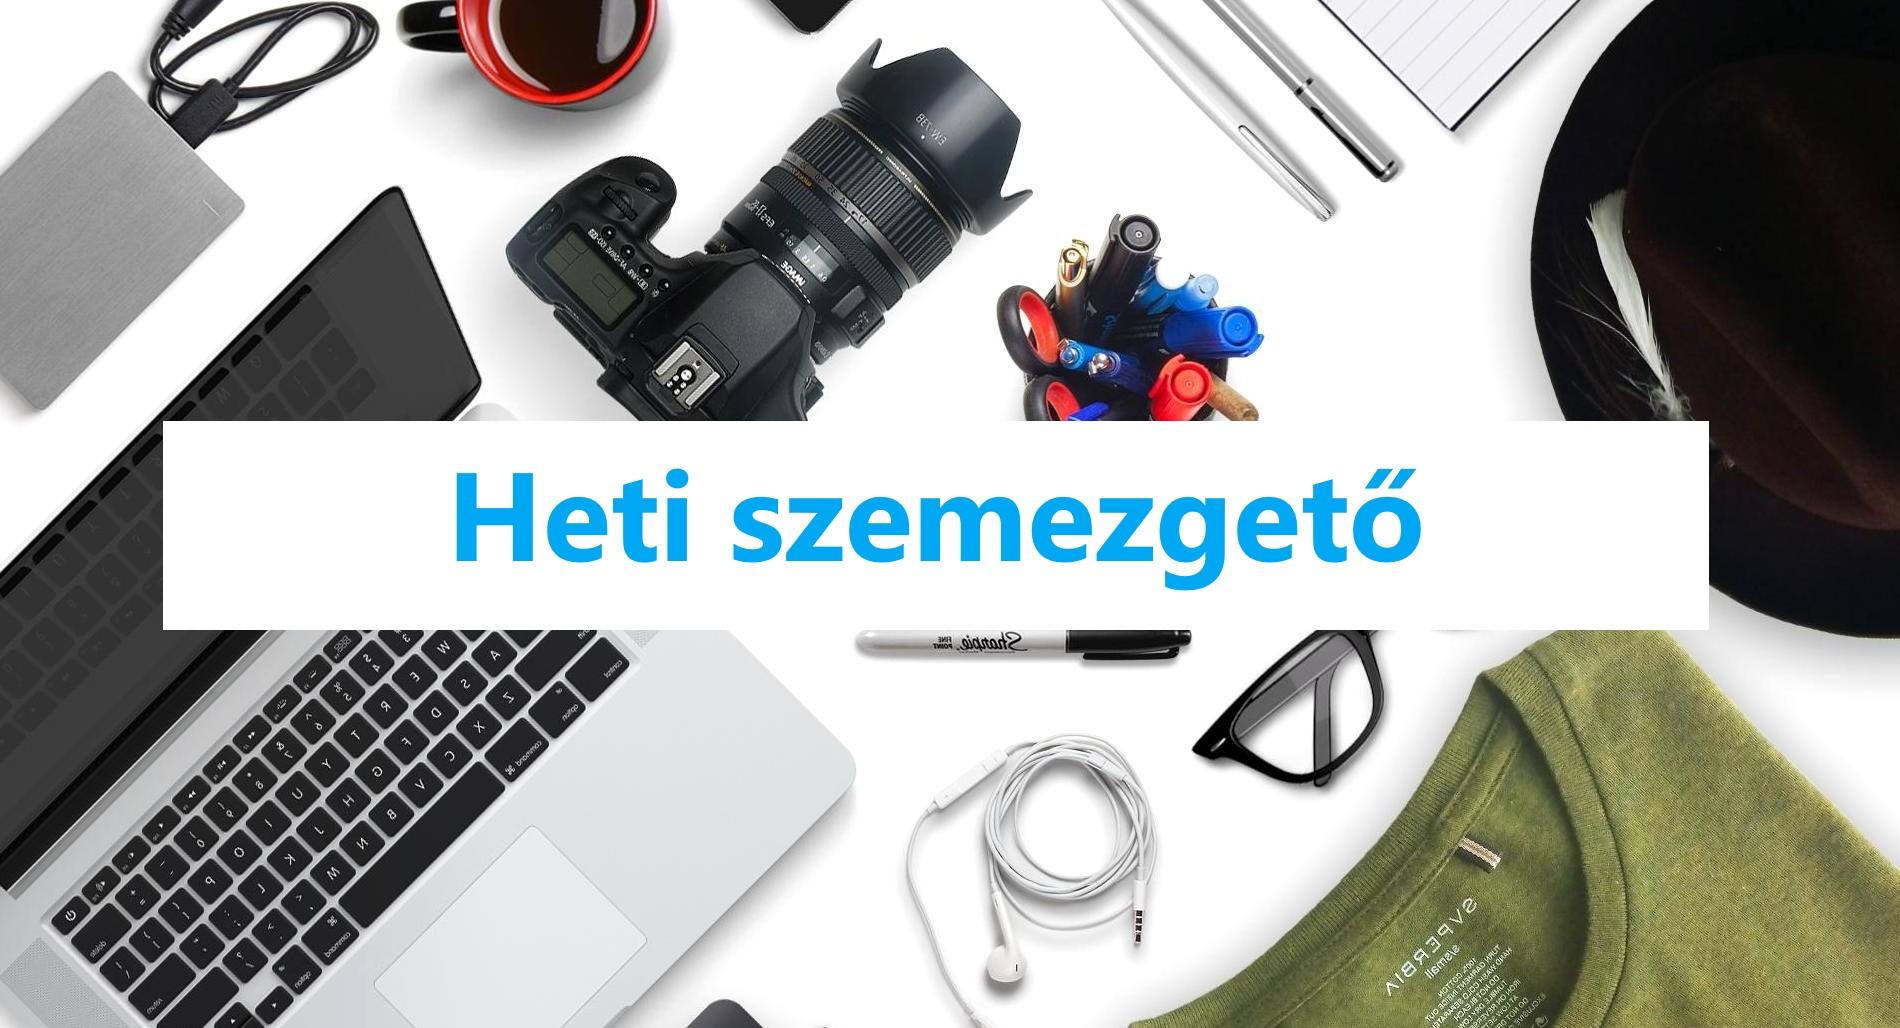 heti_szemezgeto_uj_5.jpg